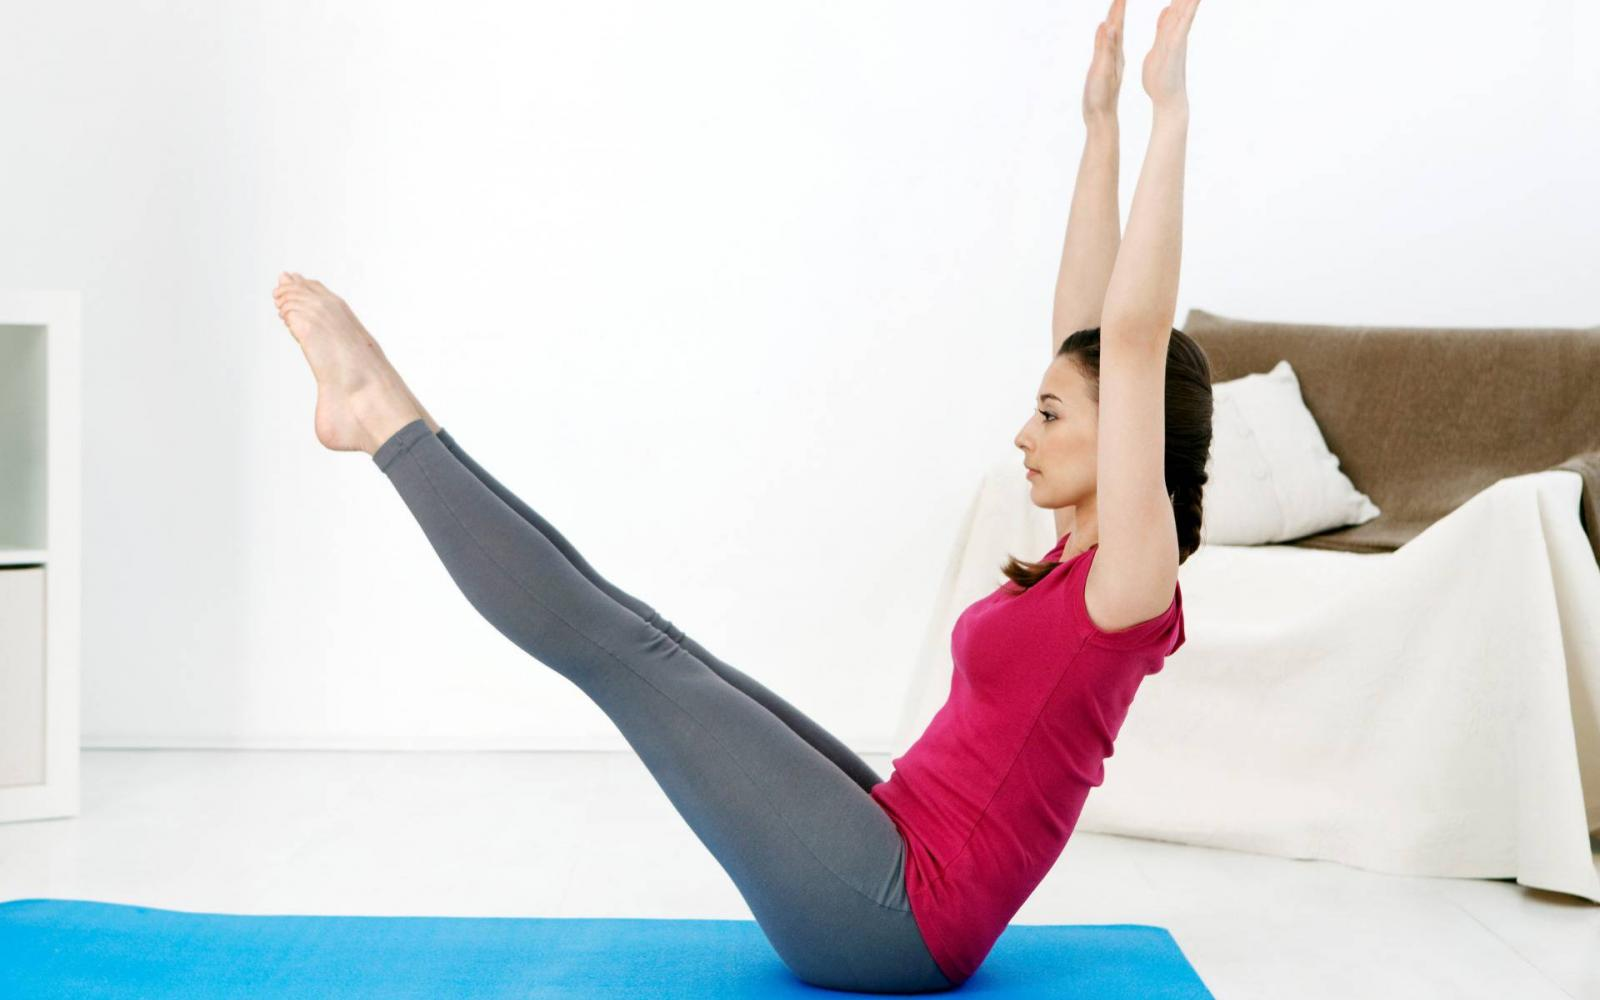 magas vérnyomás milyen fizikai gyakorlatokat végezhet MTB gyakorlatok magas vérnyomás ellen